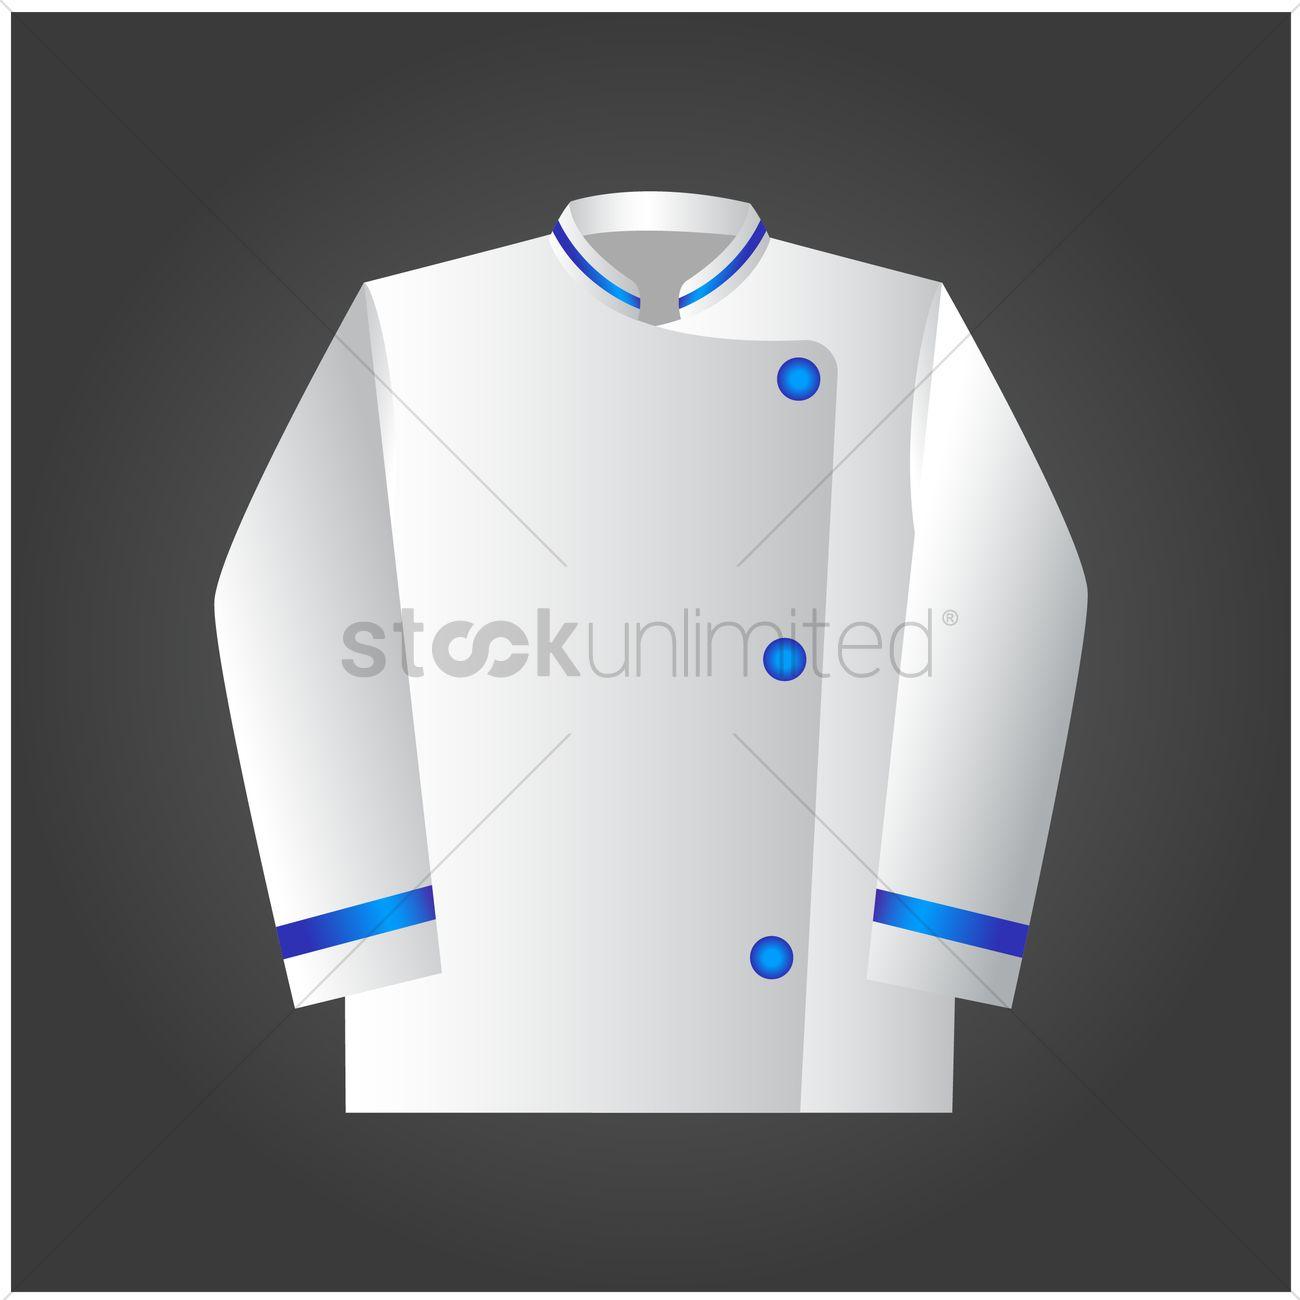 Chef Uniform Vector Graphic